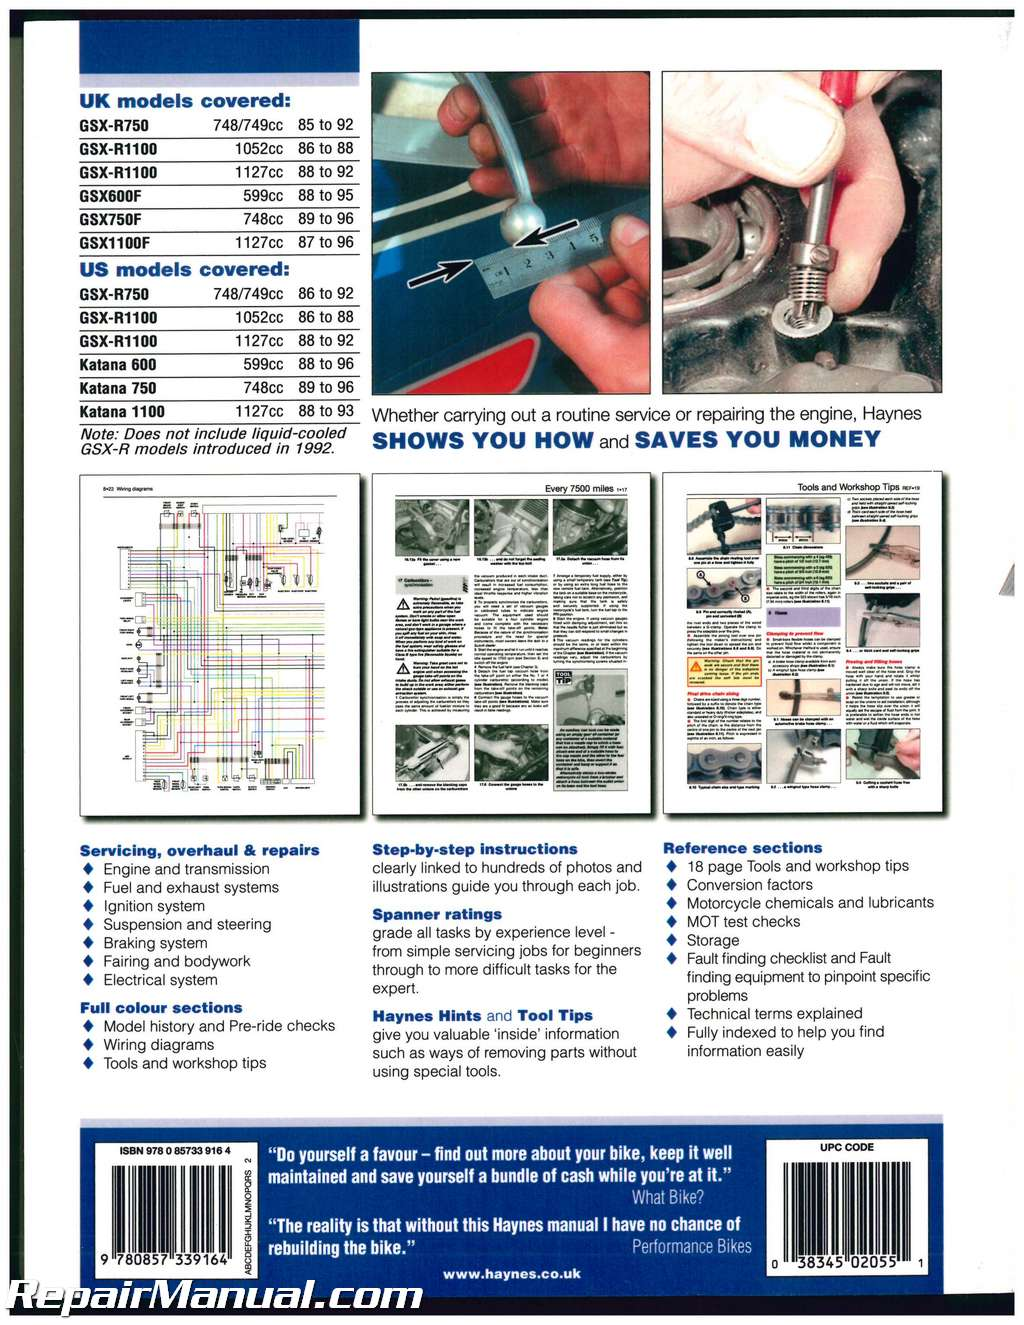 suzuki gsx r1100 1989 1992 service manual